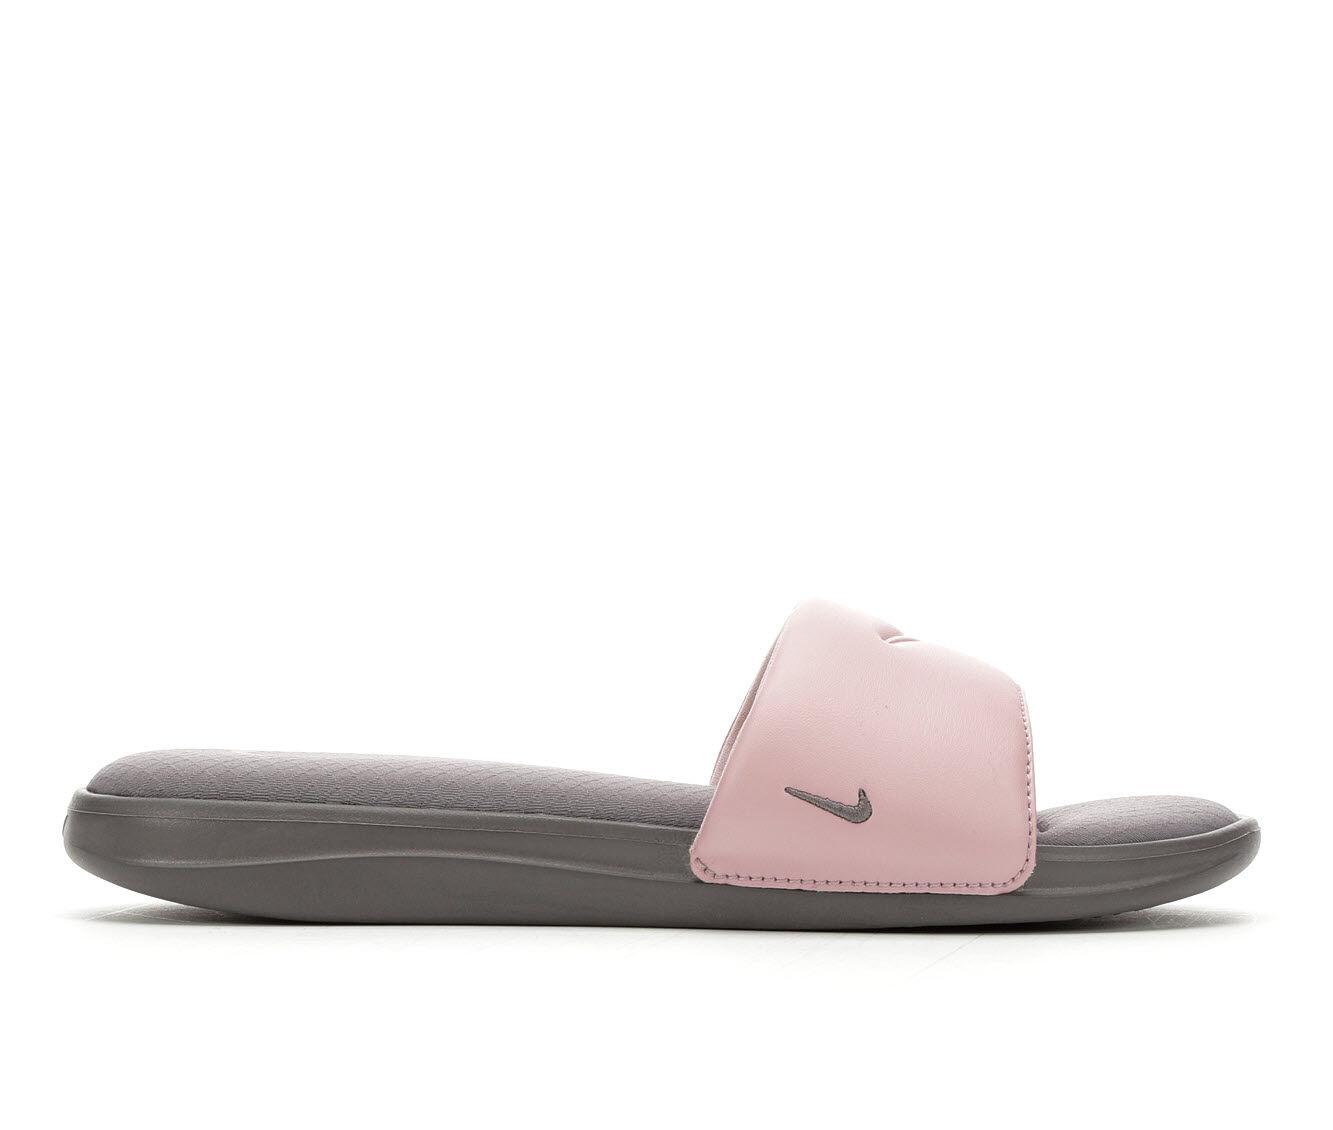 Women's Nike Ultra Comfort Slde 3 Sport Sandals Gunsmoke/Plum